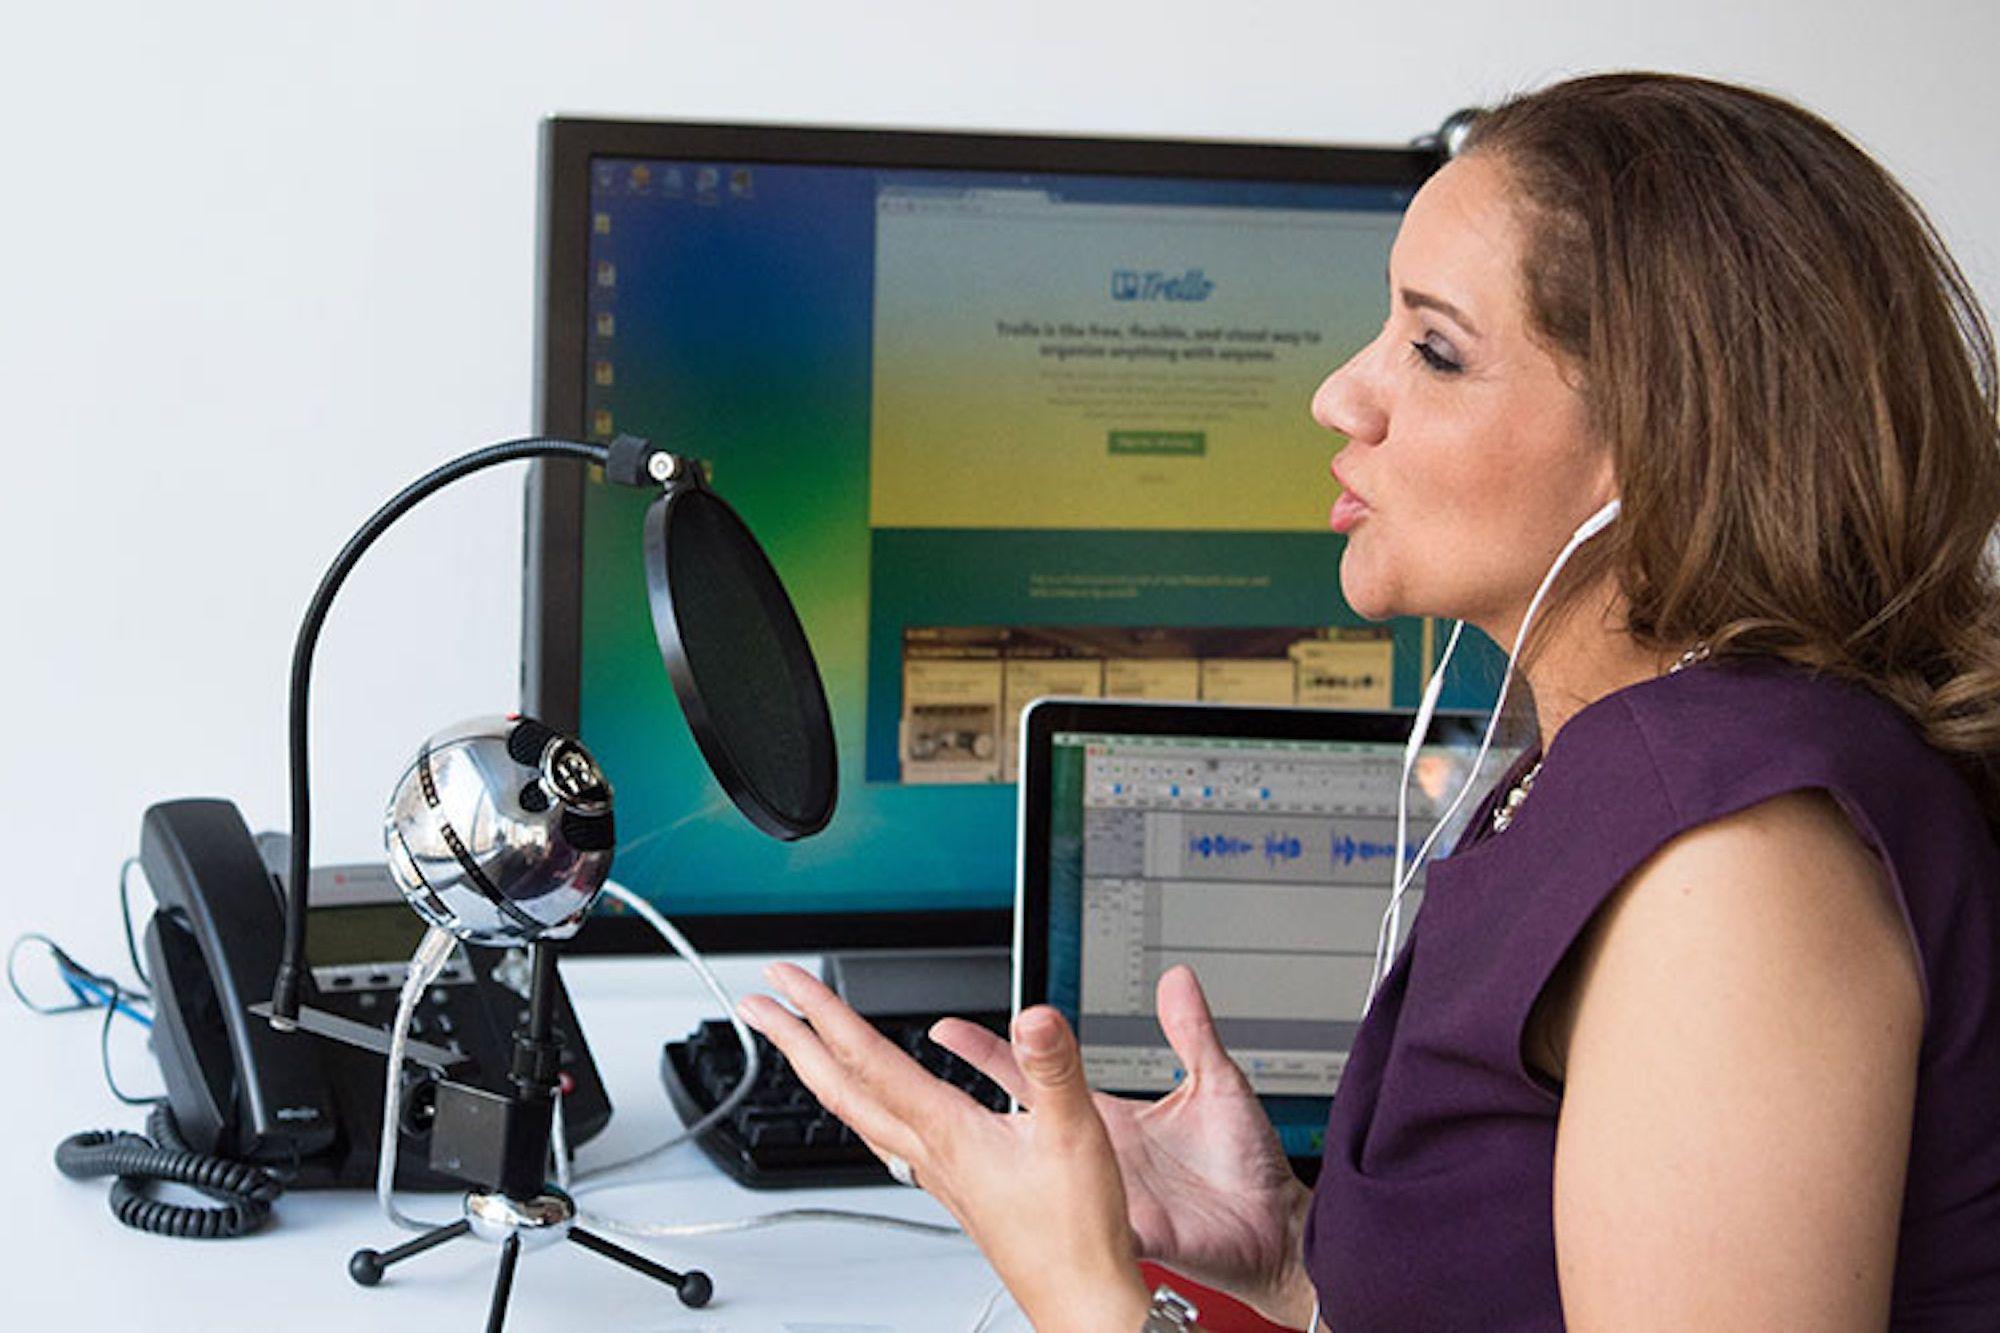 Mengenal Arti Kata Podcasting dan Tema-Tema Serunya